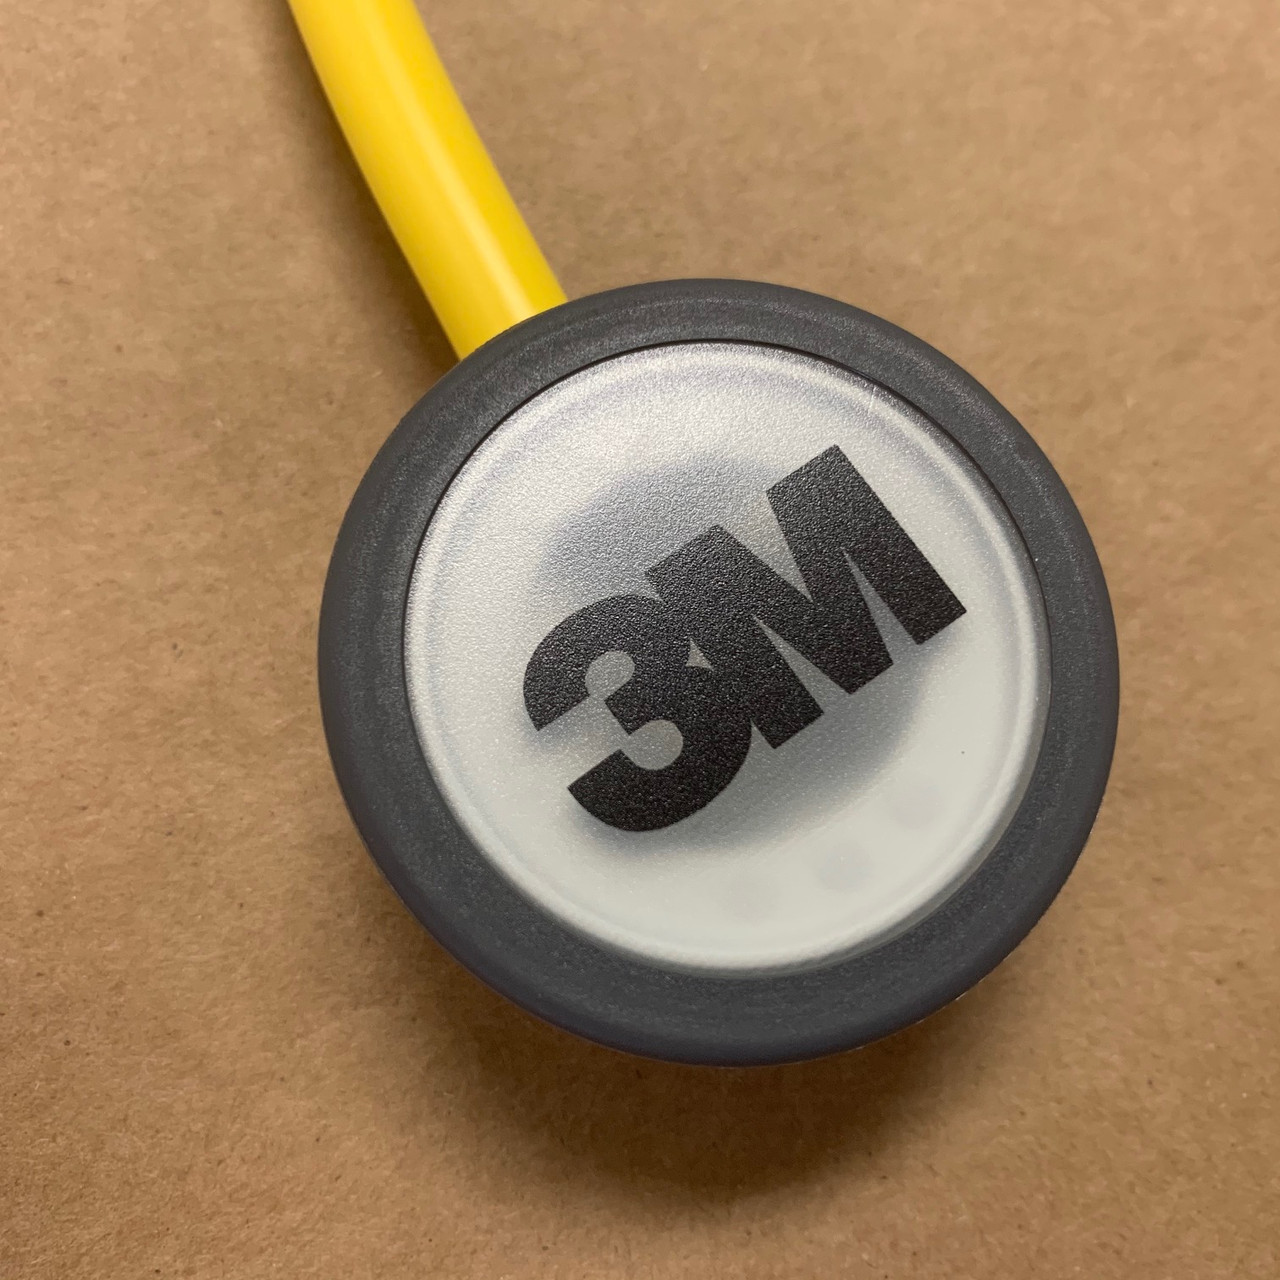 3M Single-Patient Stethoscope SPS-YA1010 40/case